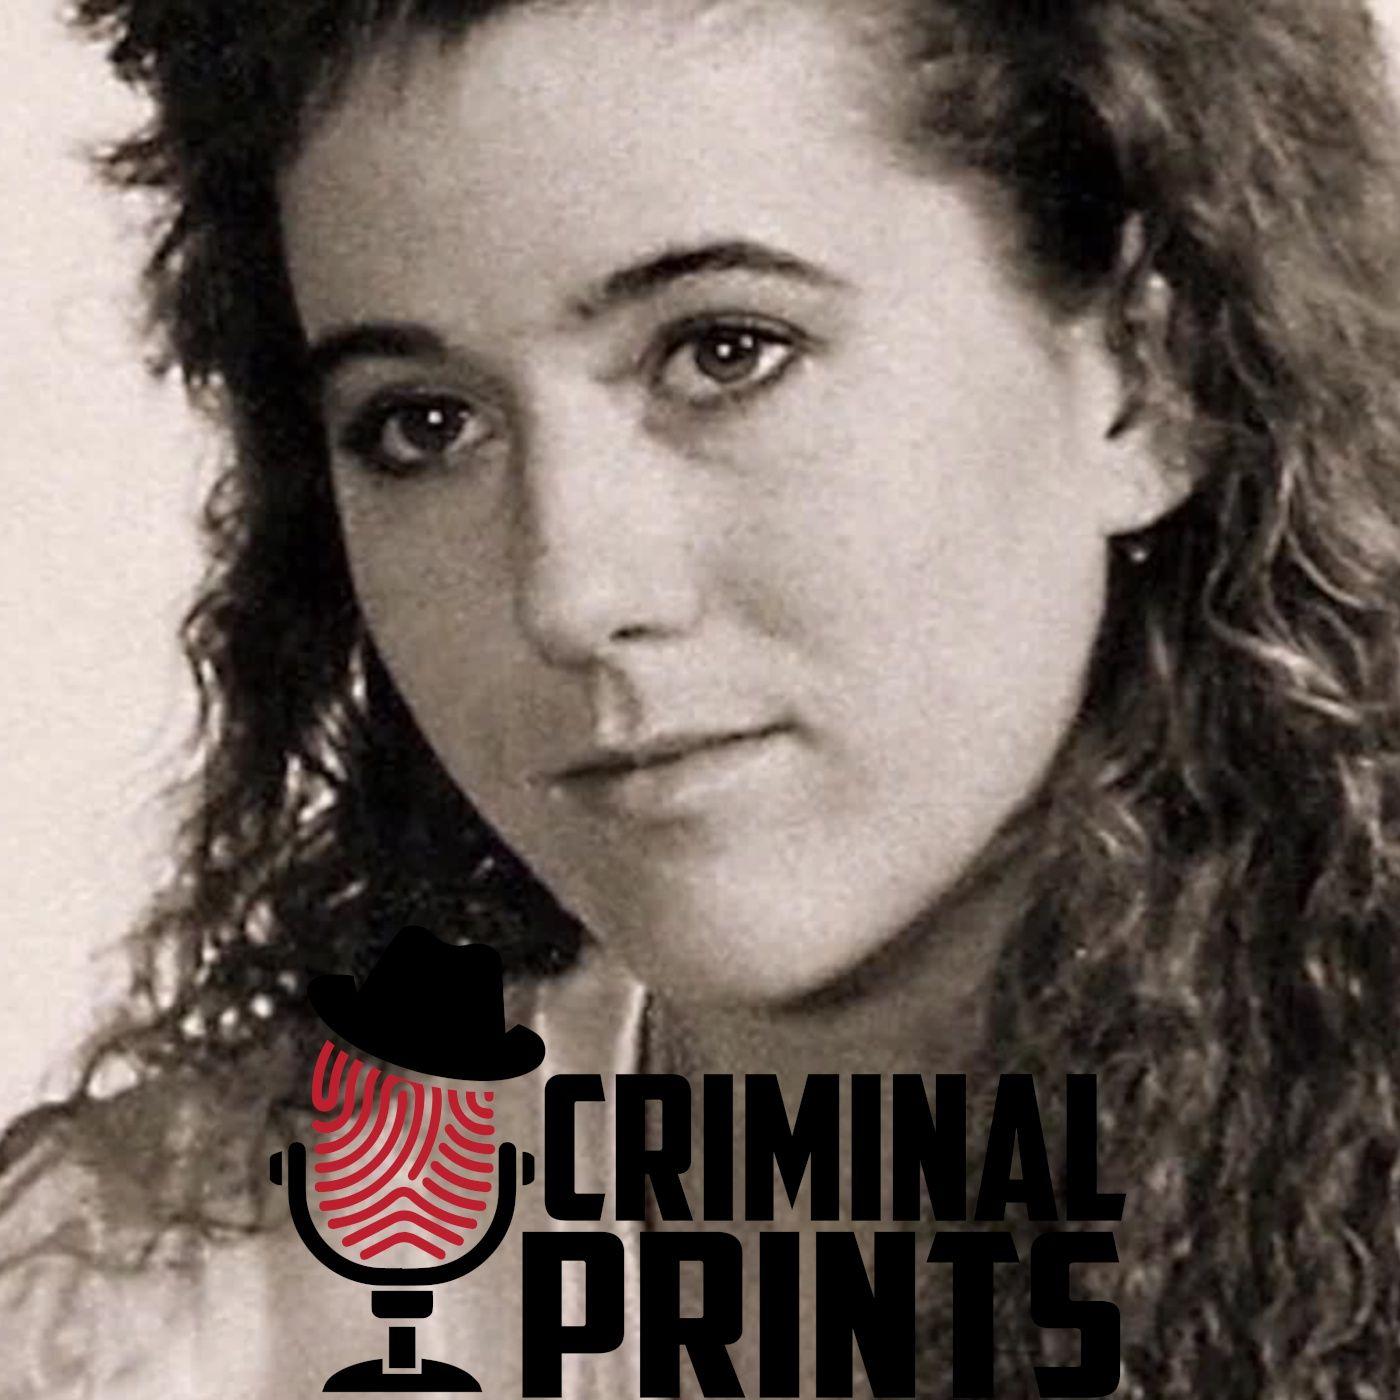 The disappearance of Tara Calico